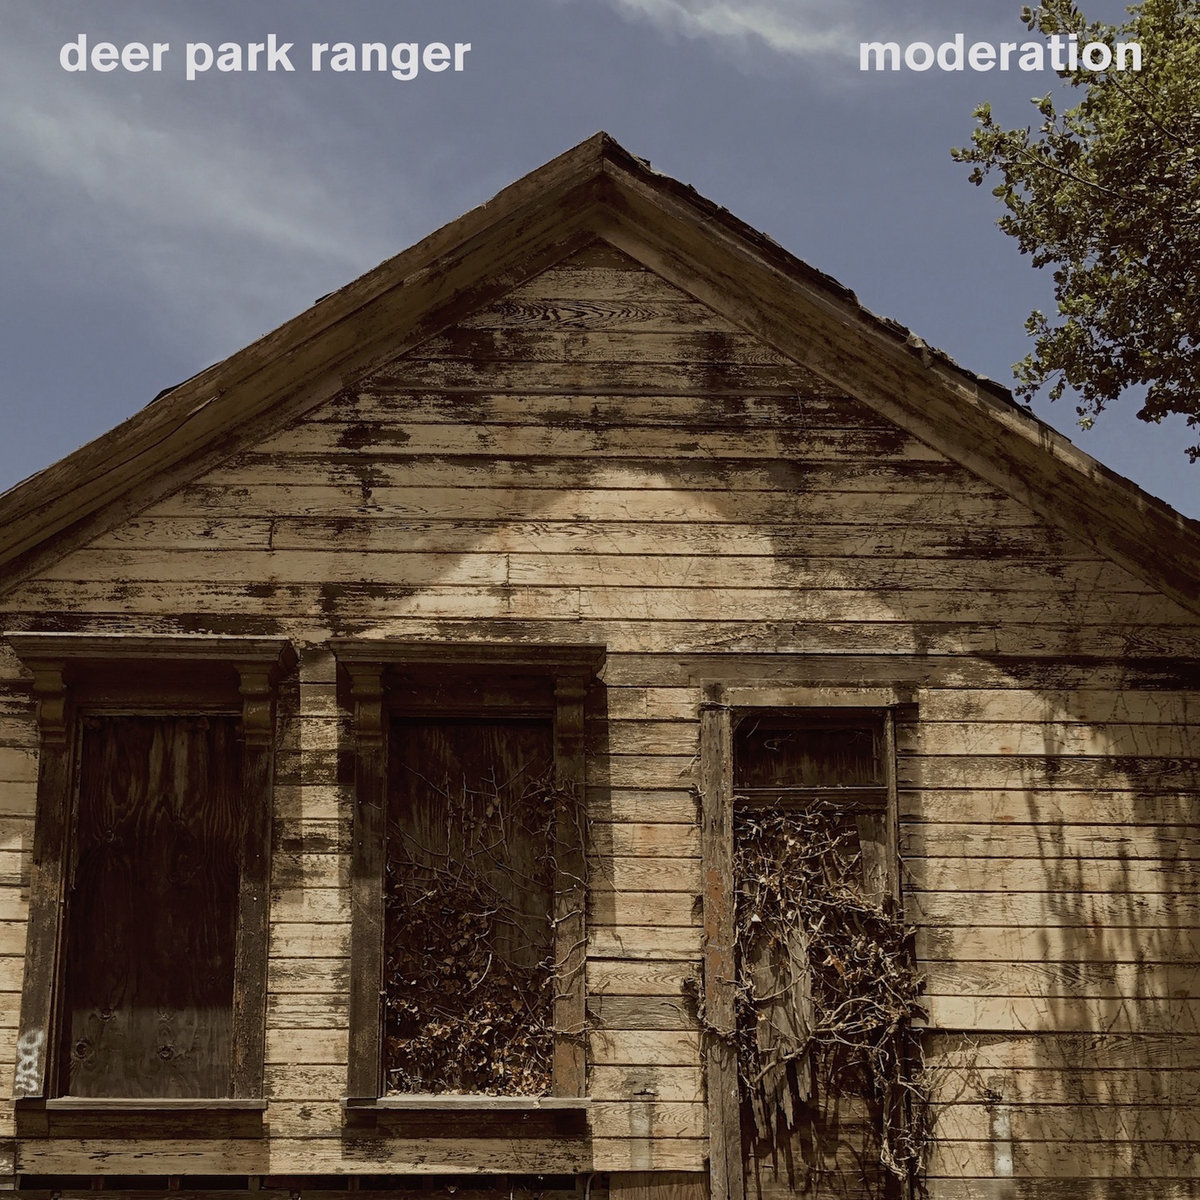 Deer Park Ranger   Bandcamp